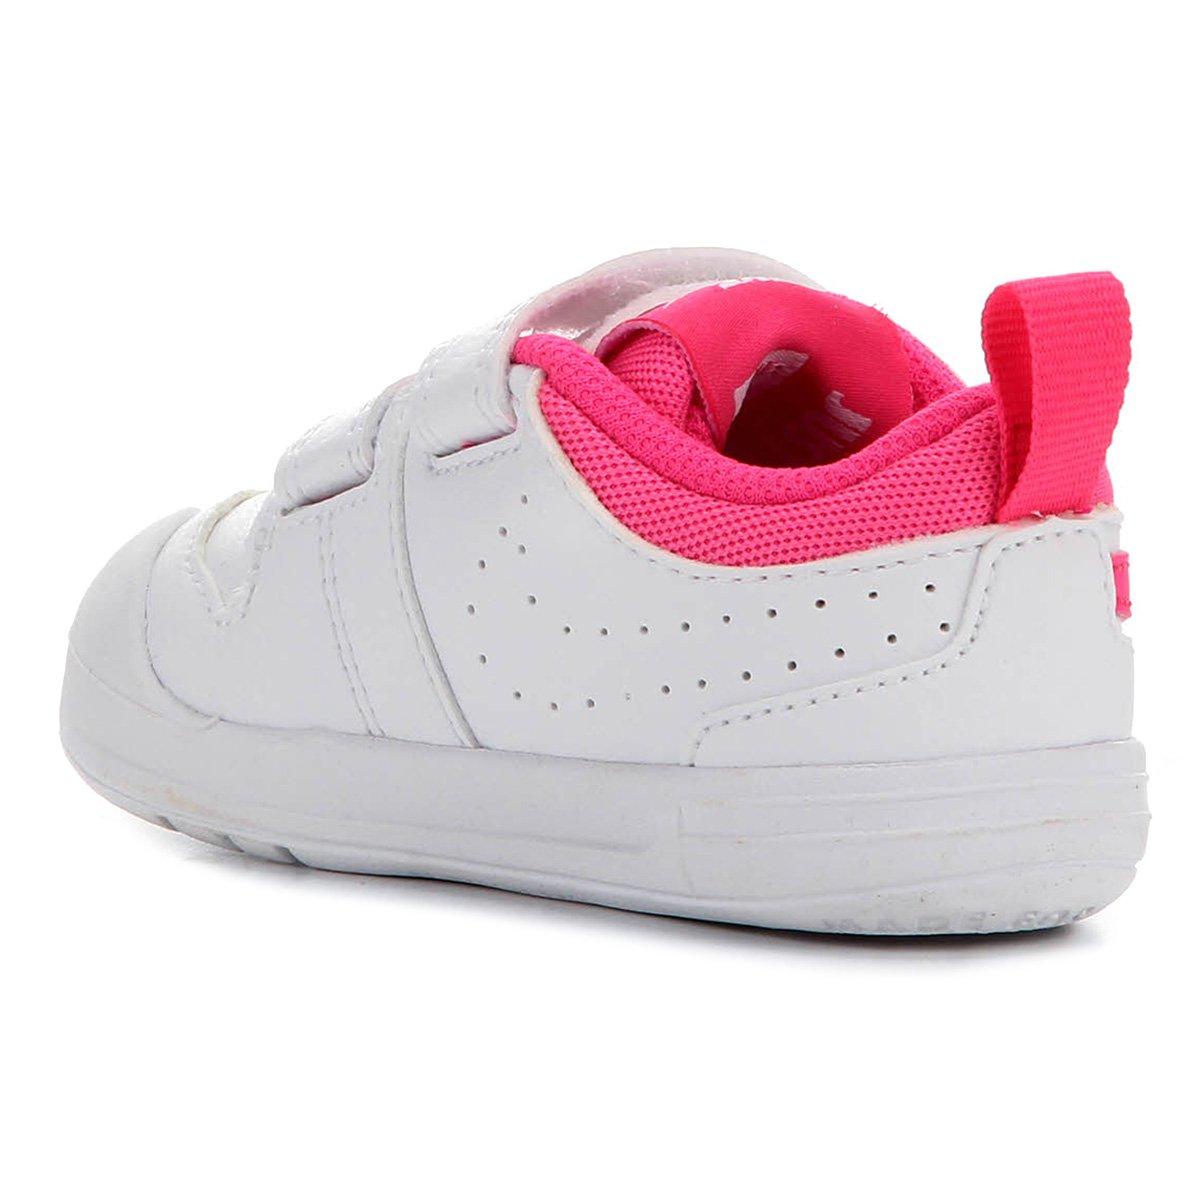 Tênis Infantil Nike Pico 5 Velcro - Tam: 24 - 1